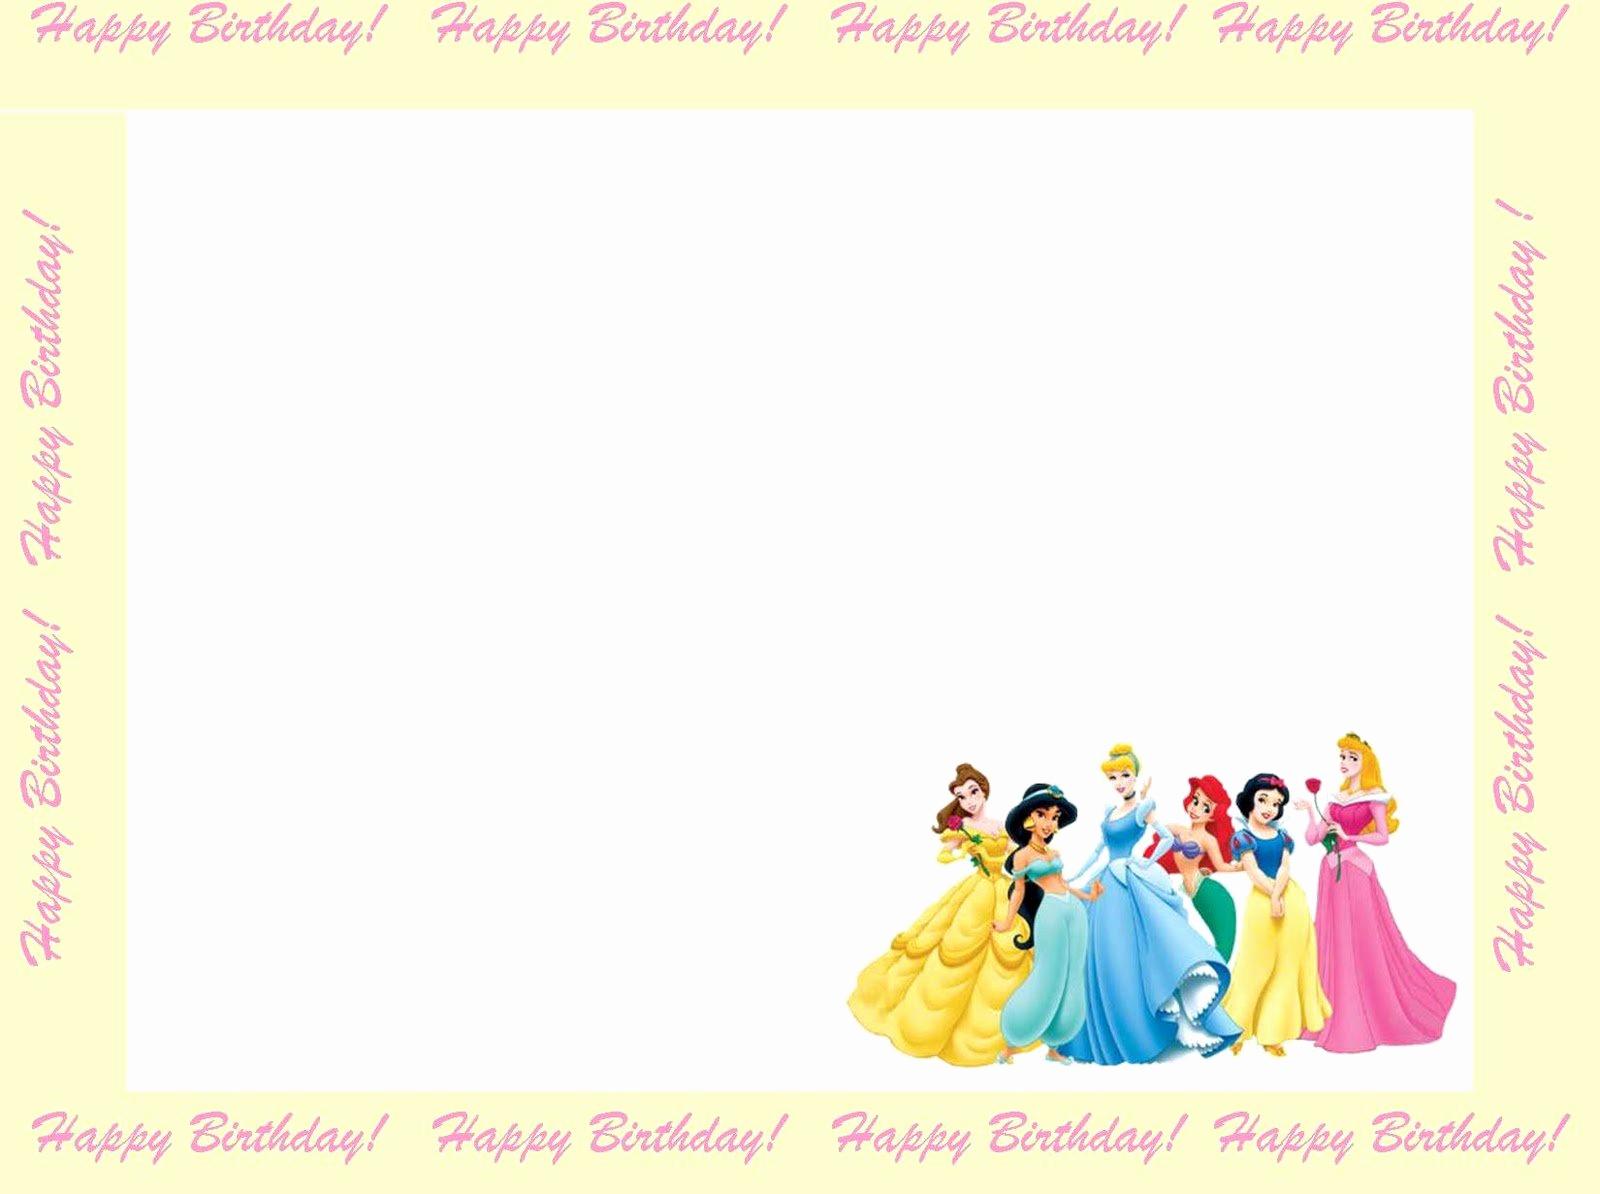 Free Disney Princess Invitation Template Best Of Disney Princesses Birthday Invitations Disney Princess